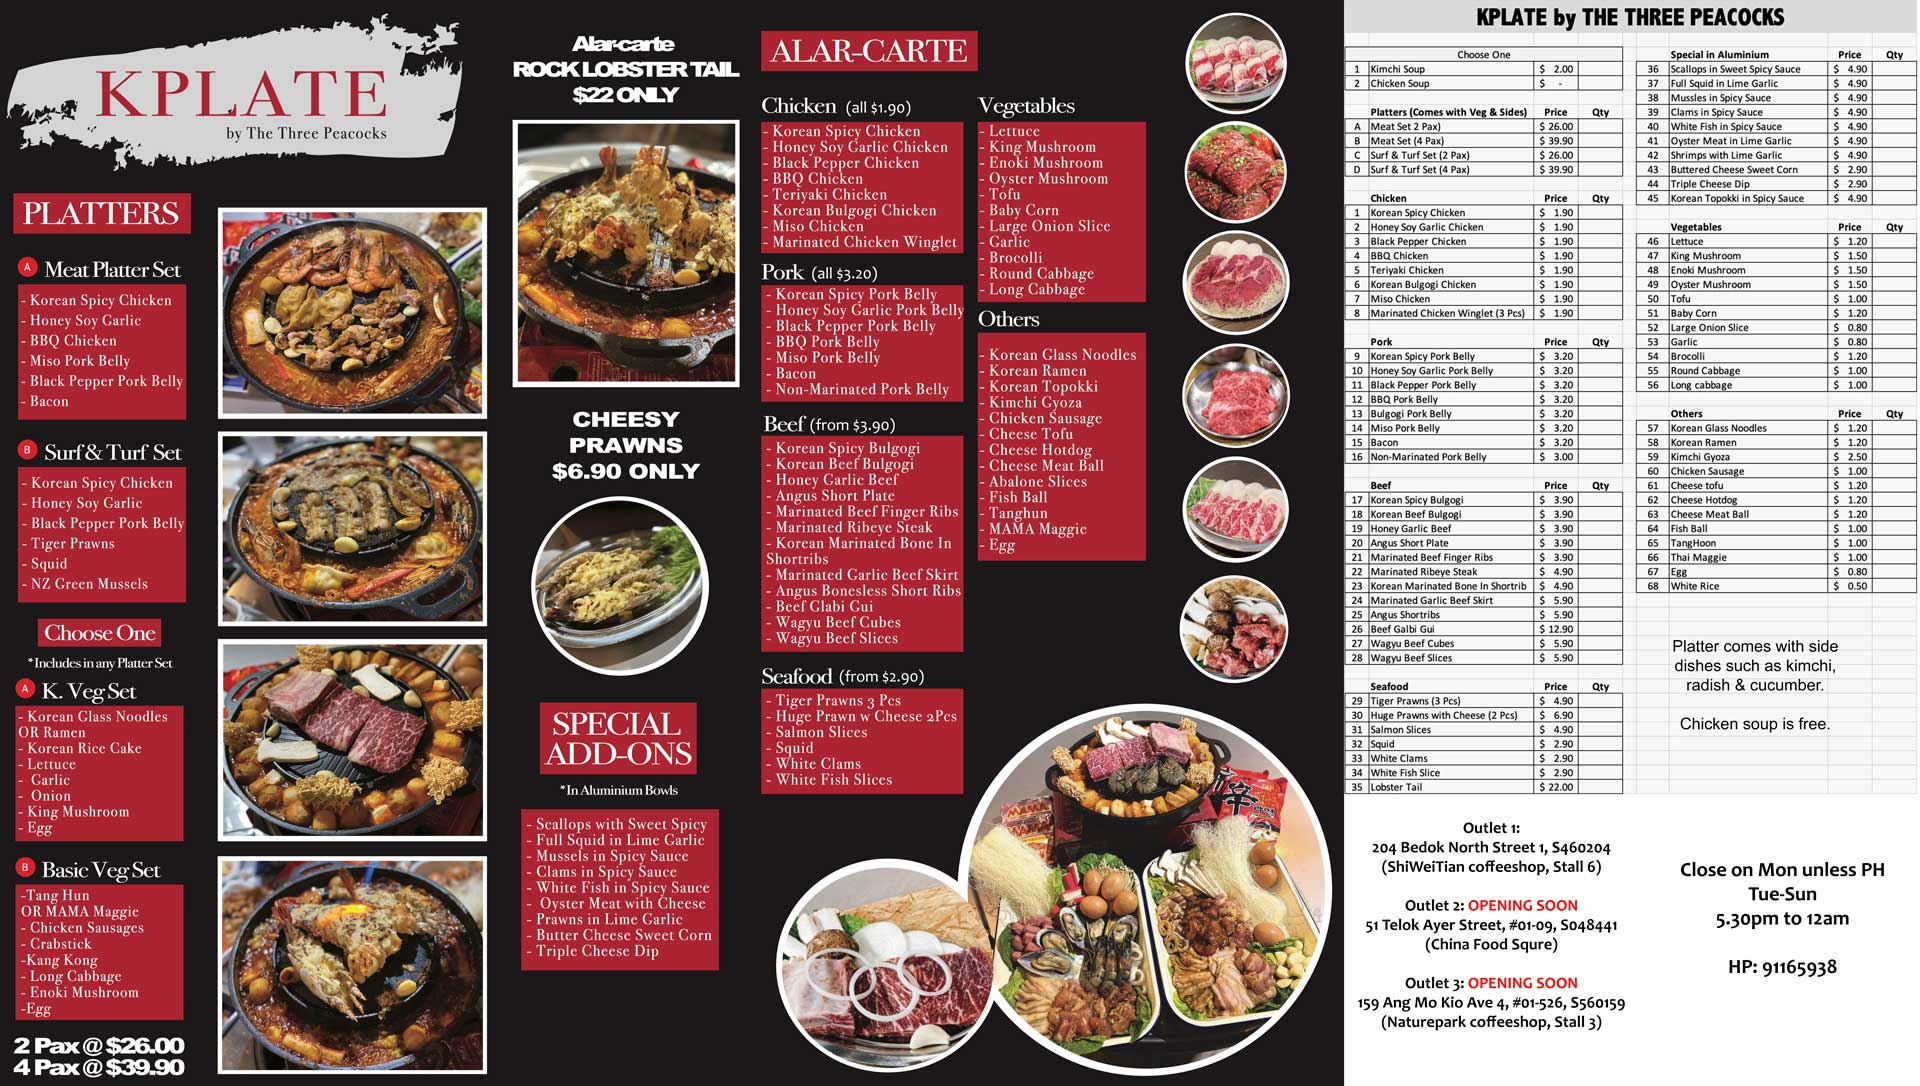 kplate-menu